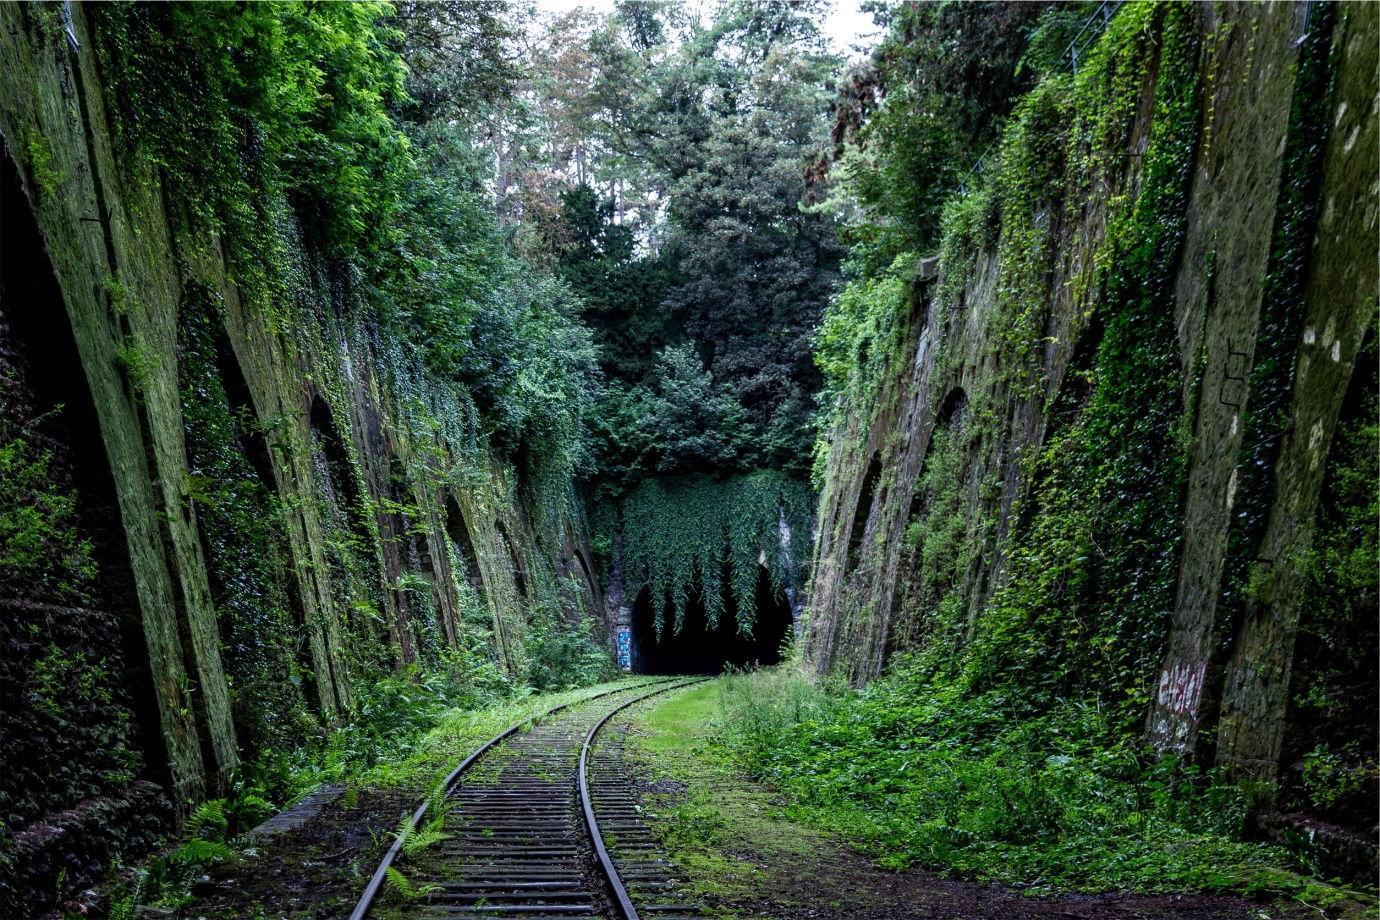 Train tracks through nature